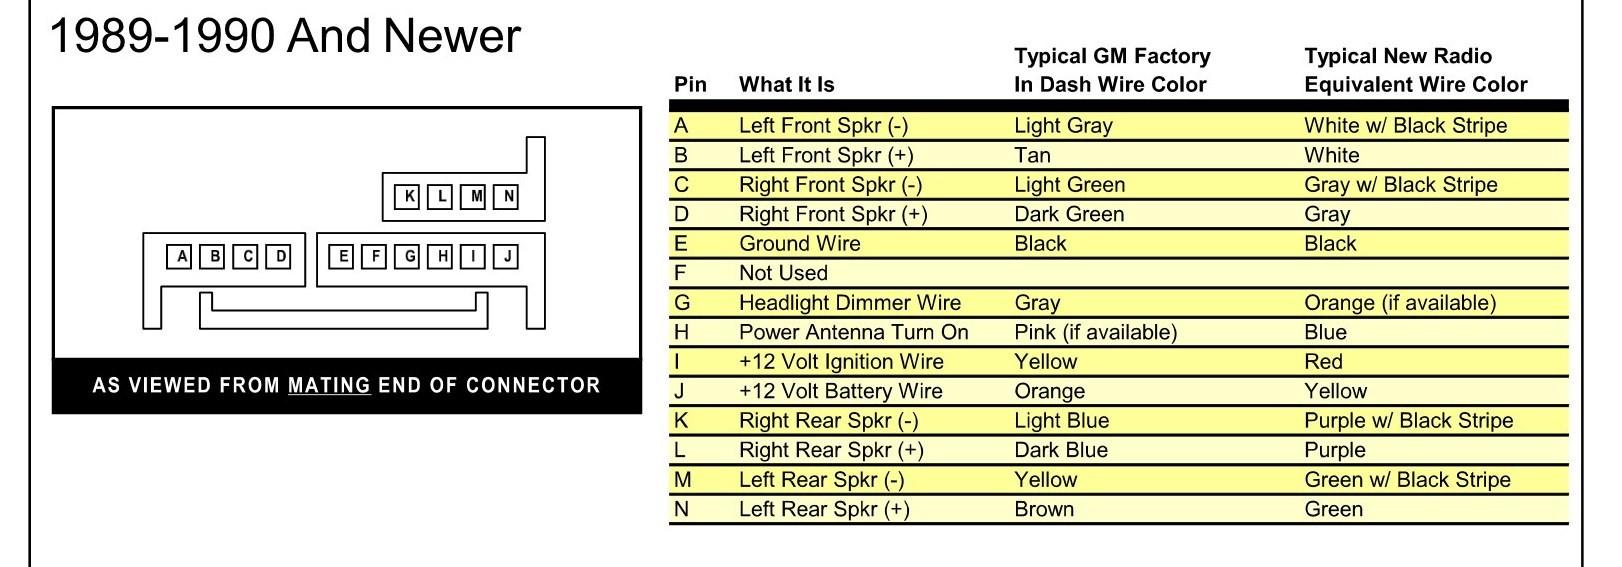 1990 Chevy Silverado Radio Wiring Diagram Sample Nec House Codes Free Download Schematic Collection 05 Diagrams Schematics Throughout 2005